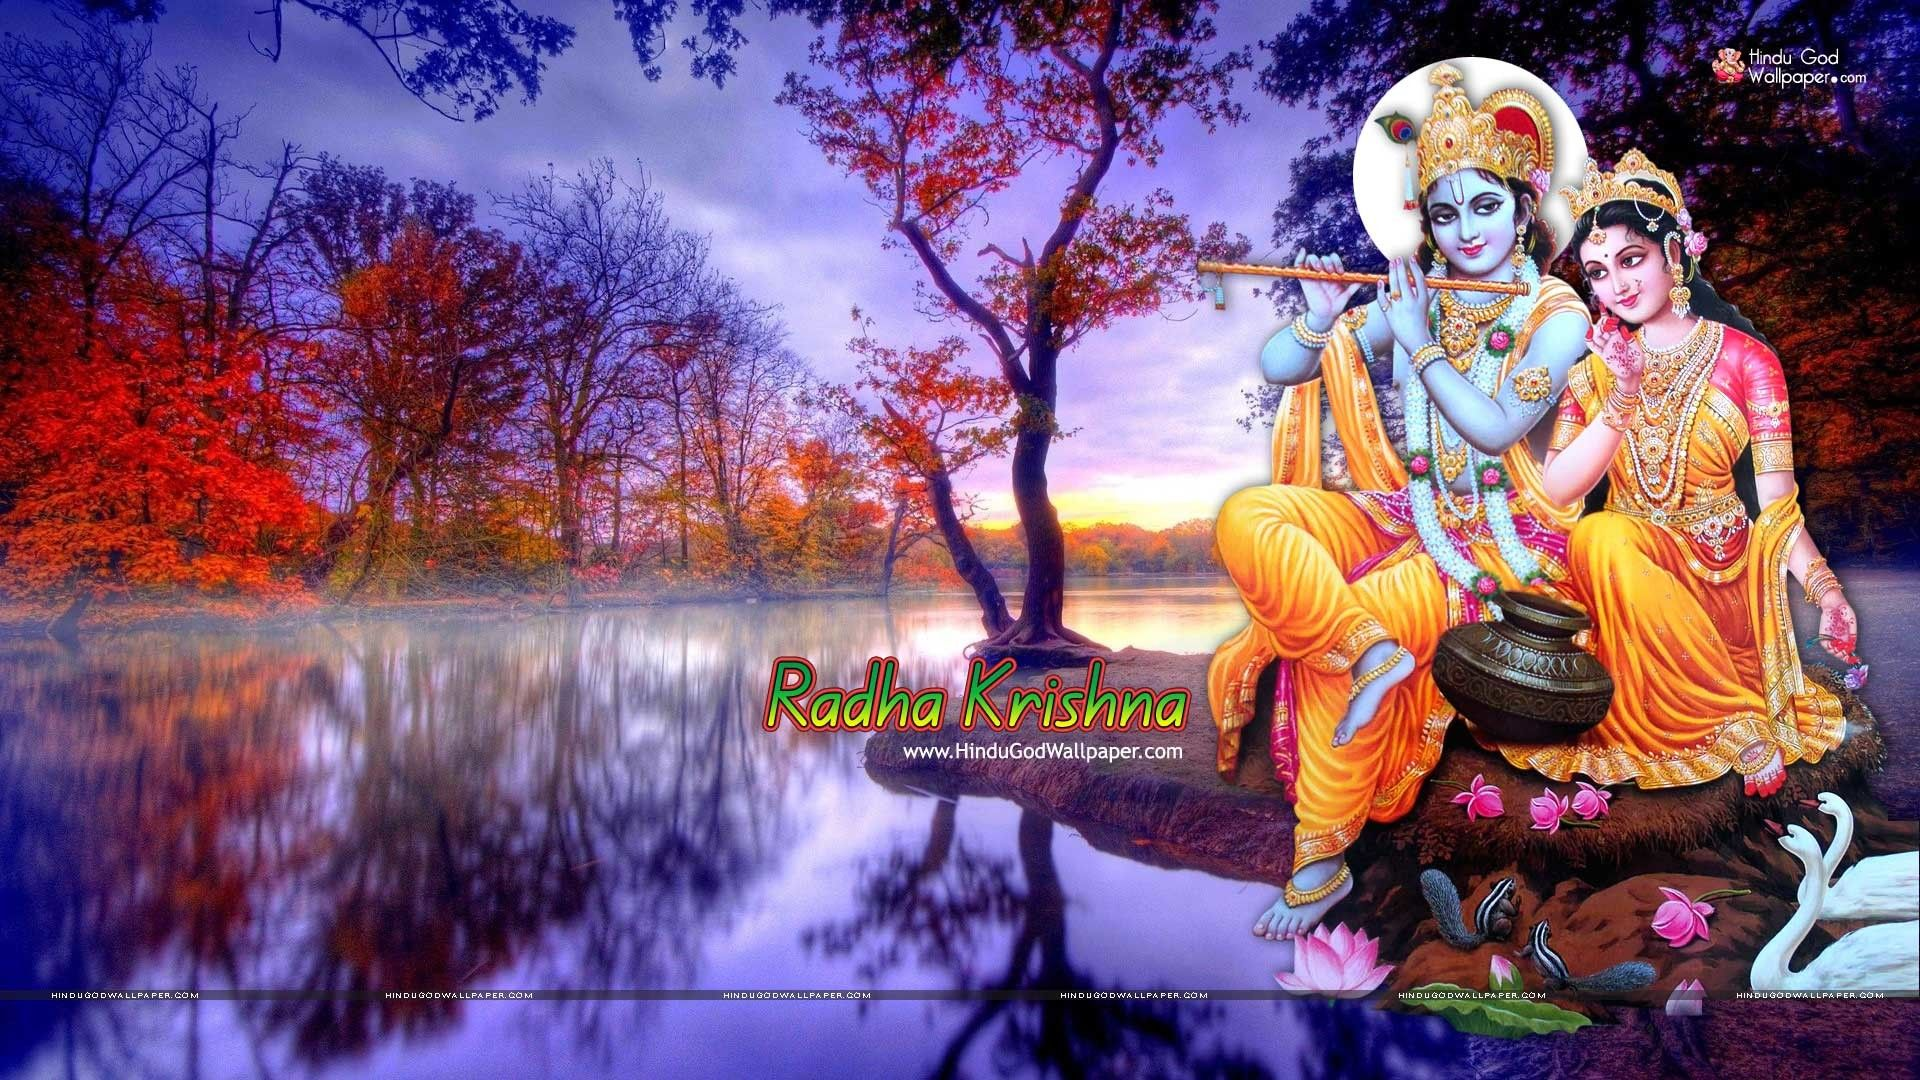 1920x1080 Most Popular Desktop Wallpaper Hd Wallpapers And Pictures Download Wallpaper Krishna Wallpaper Lord Krishna Hd Wallpaper Radha Krishna Wallpaper